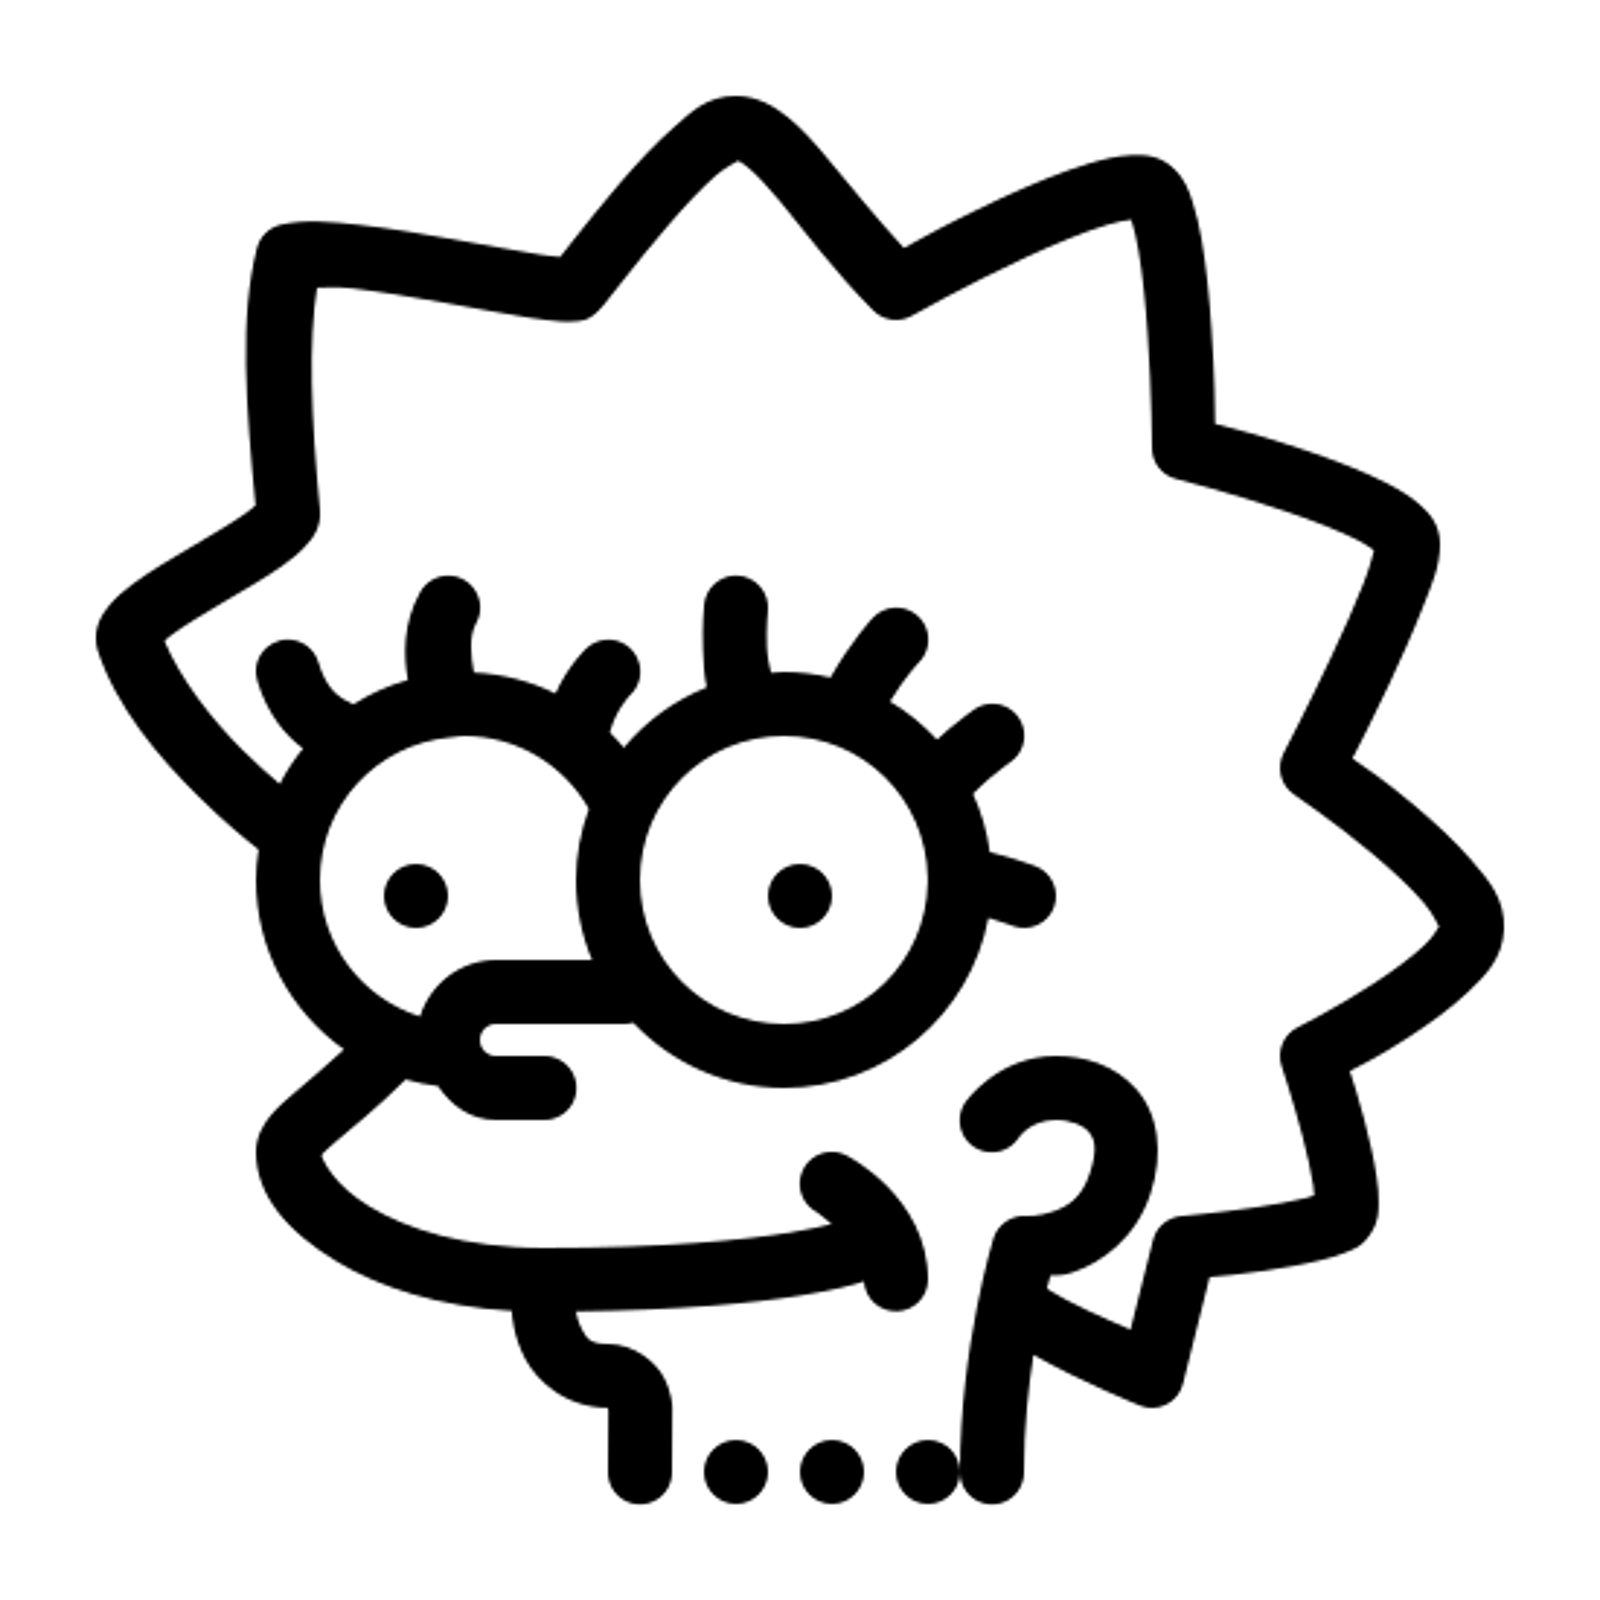 Lisa Simpson icon